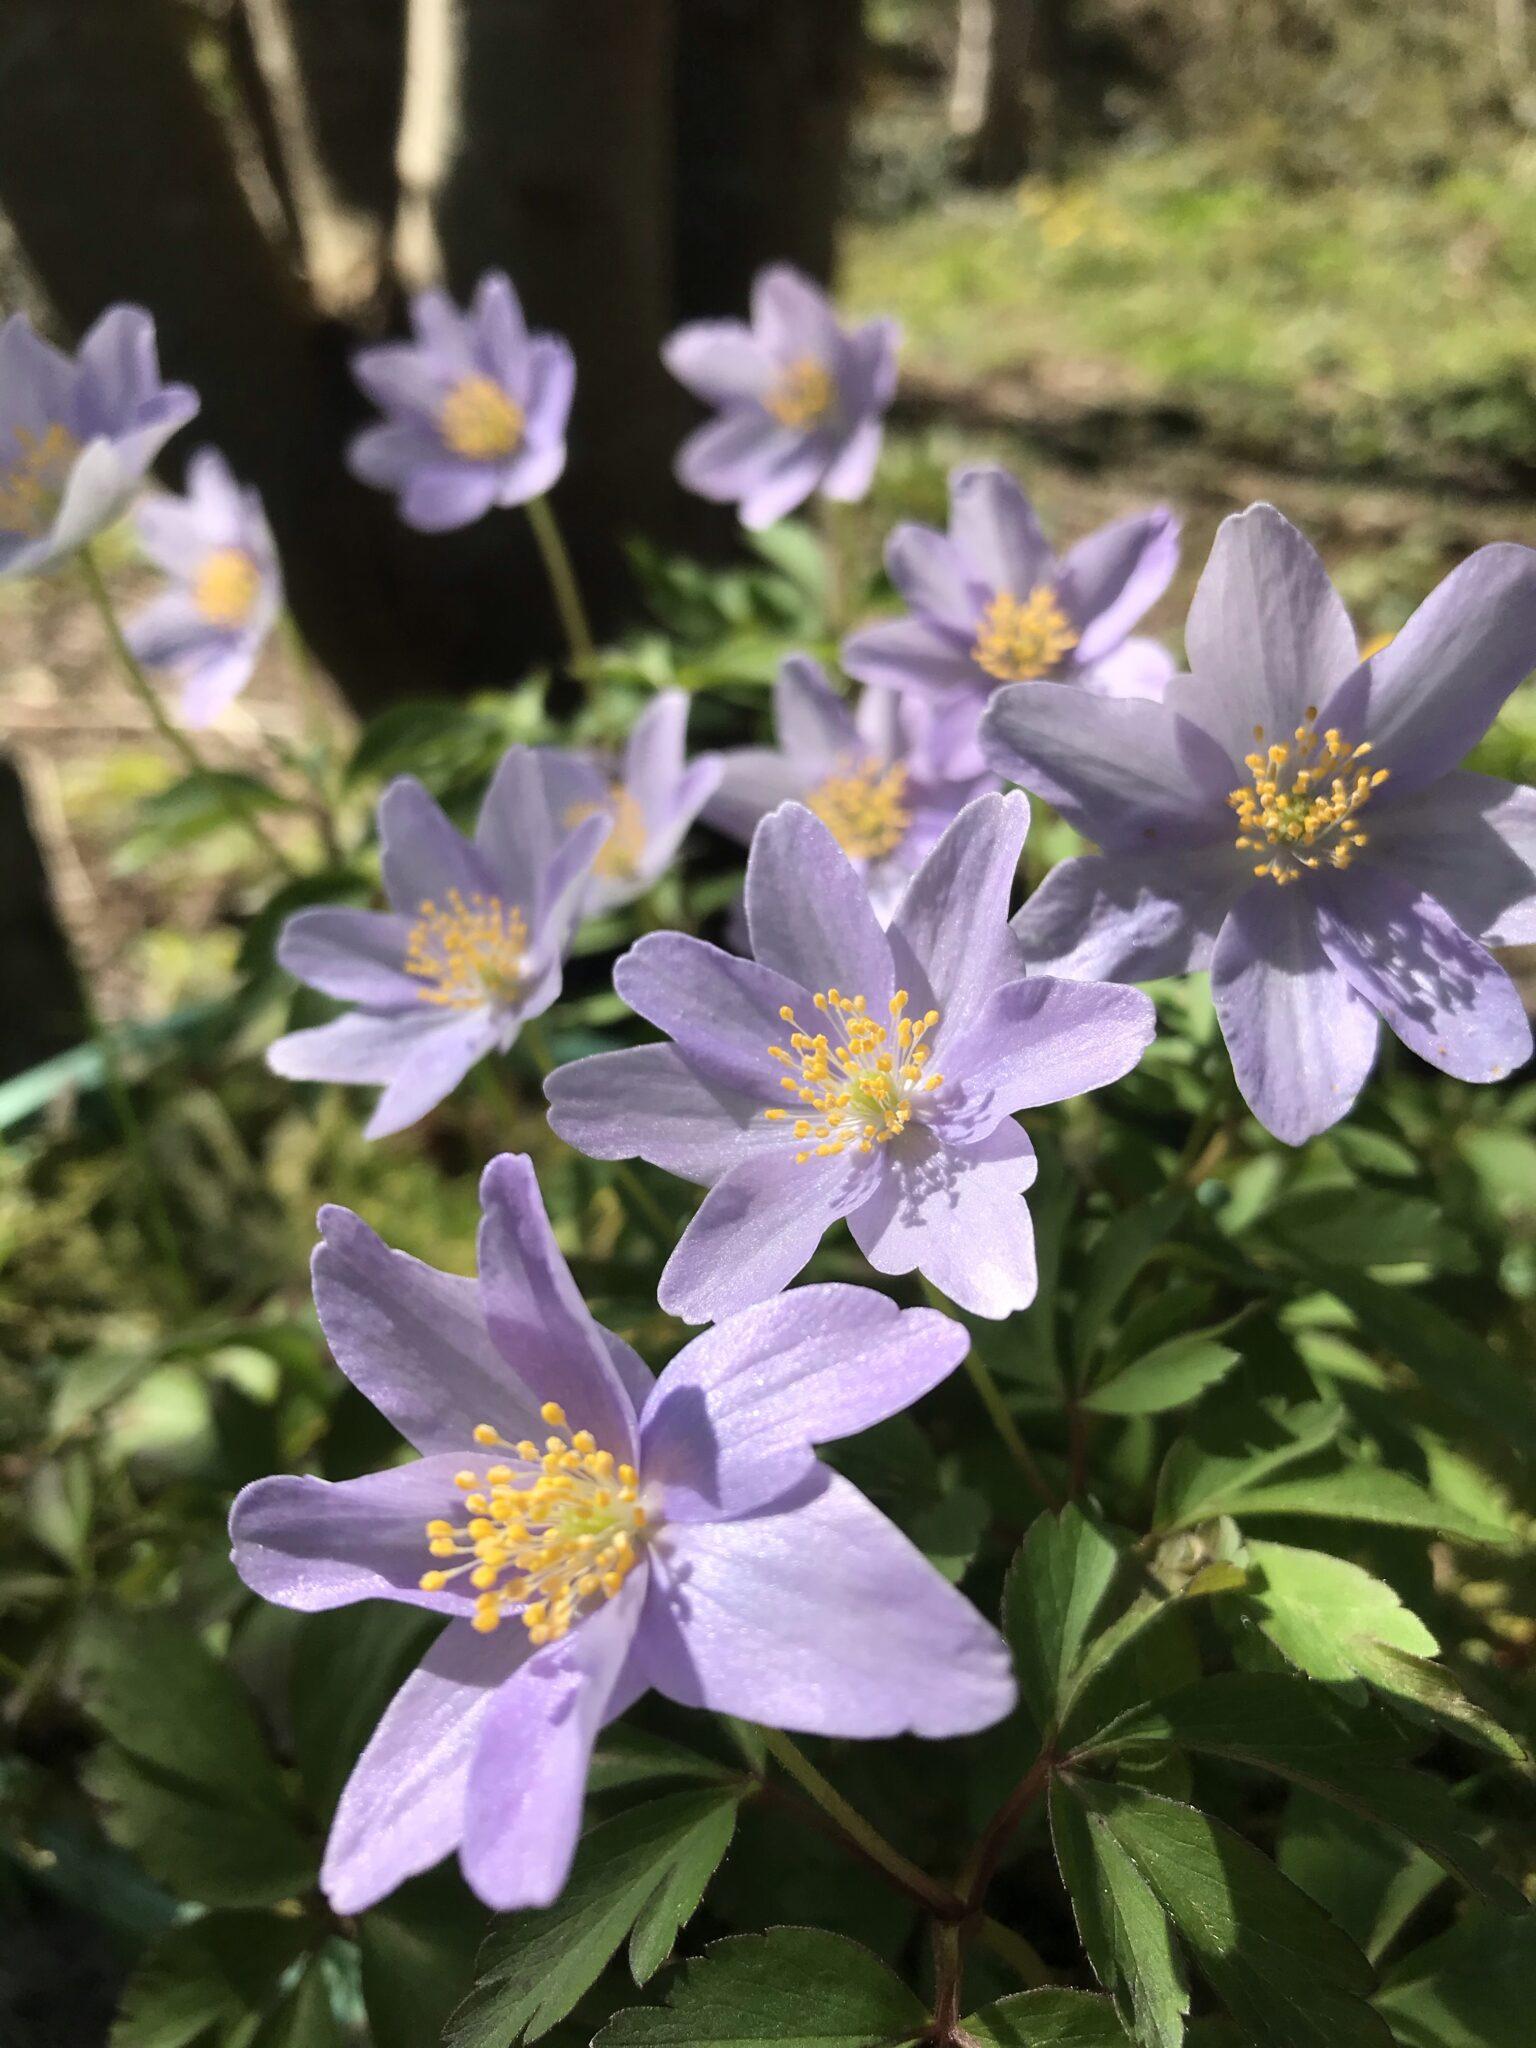 anemone_nemorosa_robinsoniana_morlas_plants